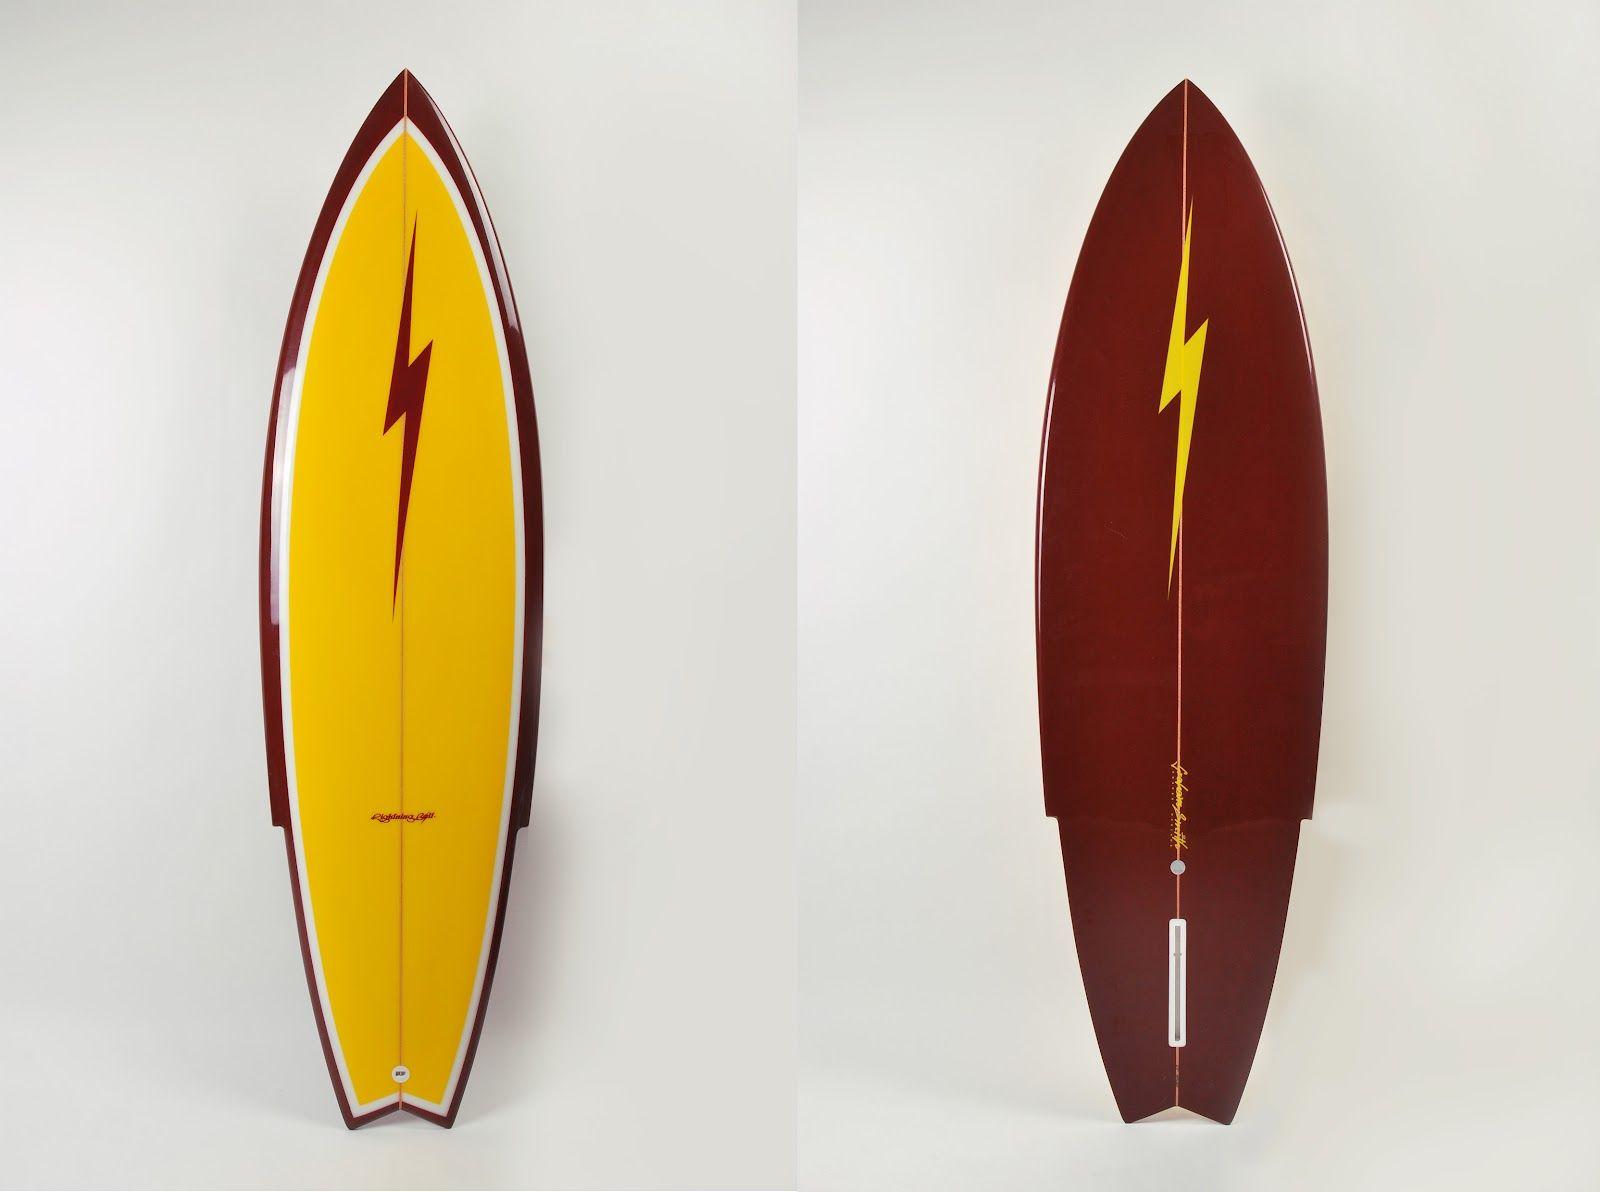 Lightning Bolt Surfboard - Stinger